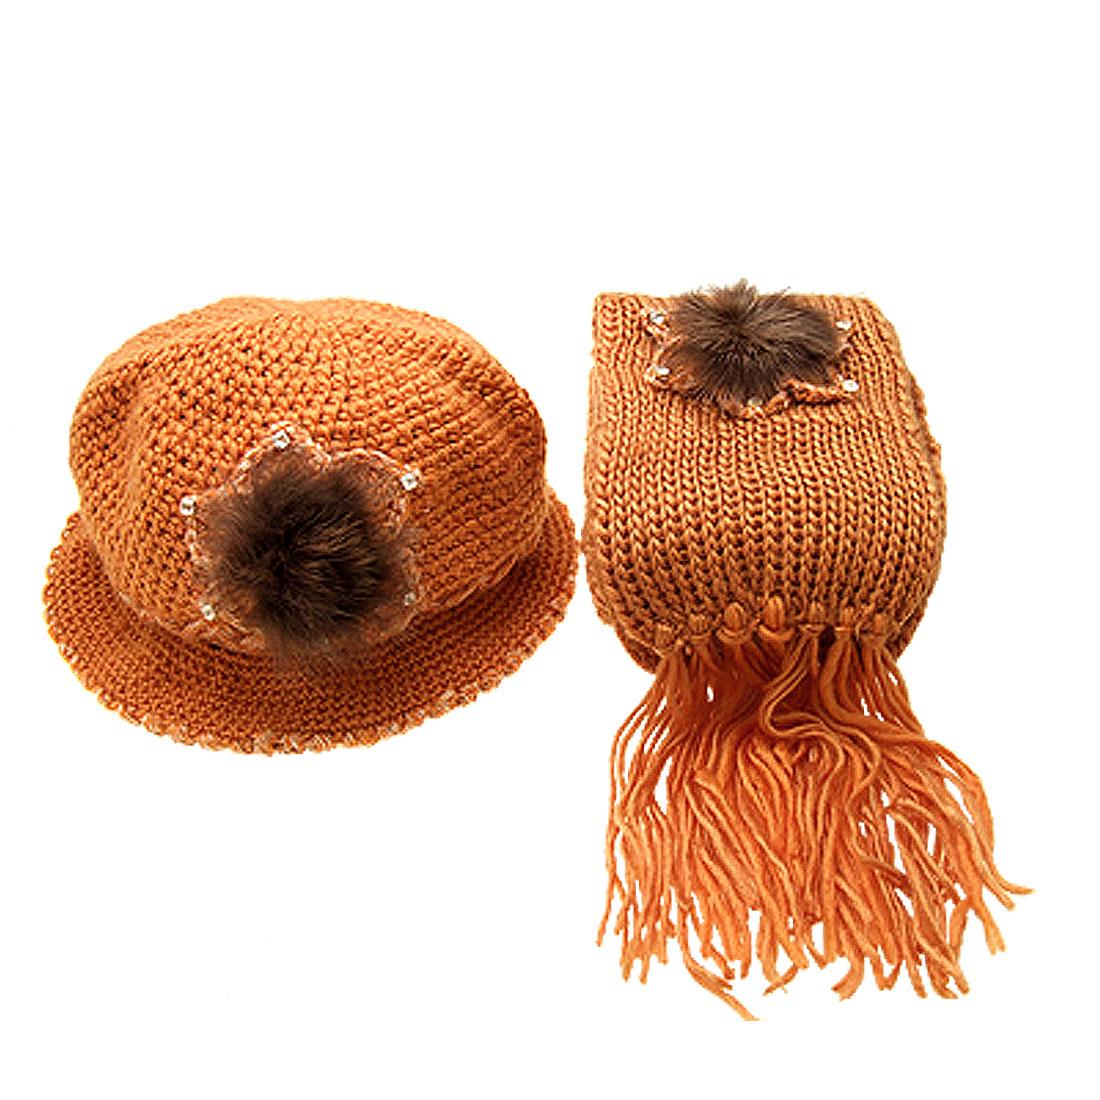 Fashion Girls Winter Knit Flapper Hat Cap with Scarf Orange